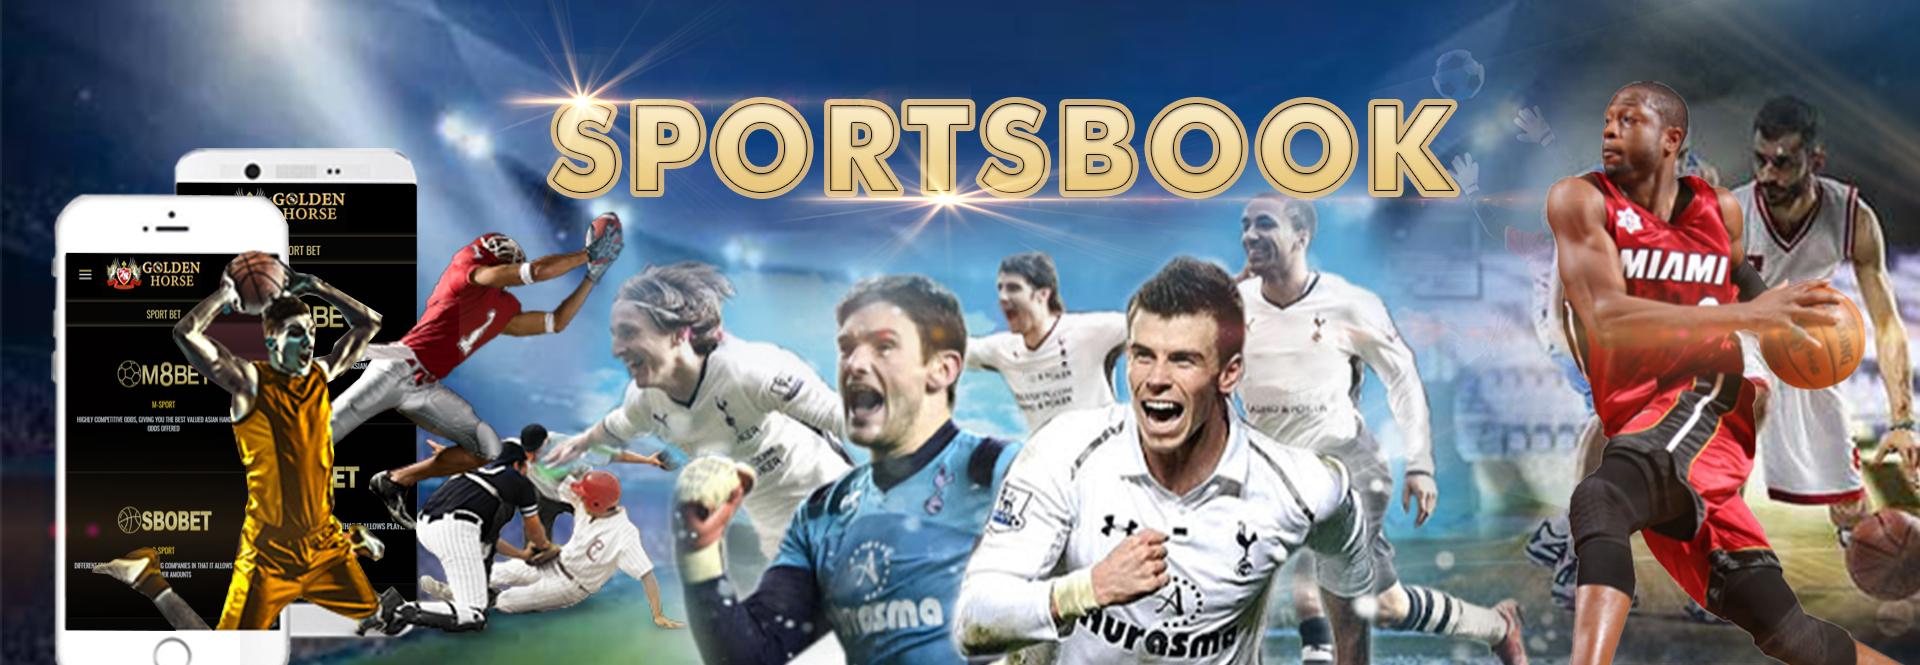 Online Sports Betting Topup, - Singapore - Malaysia